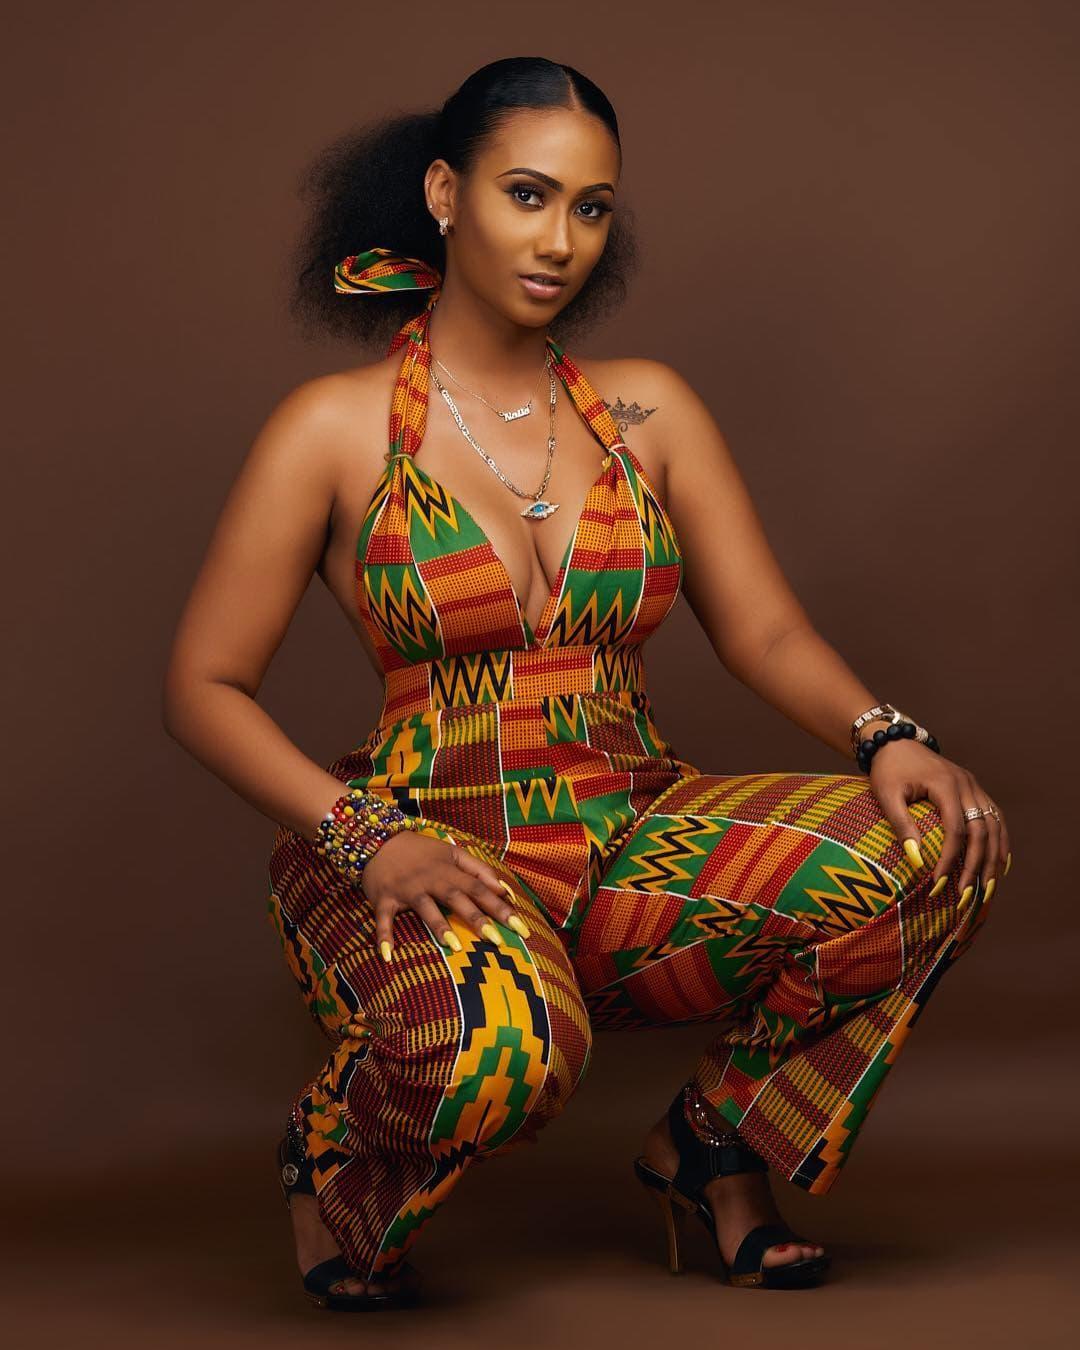 Ghanaian Entrepreneur and socialite, Hajia4real